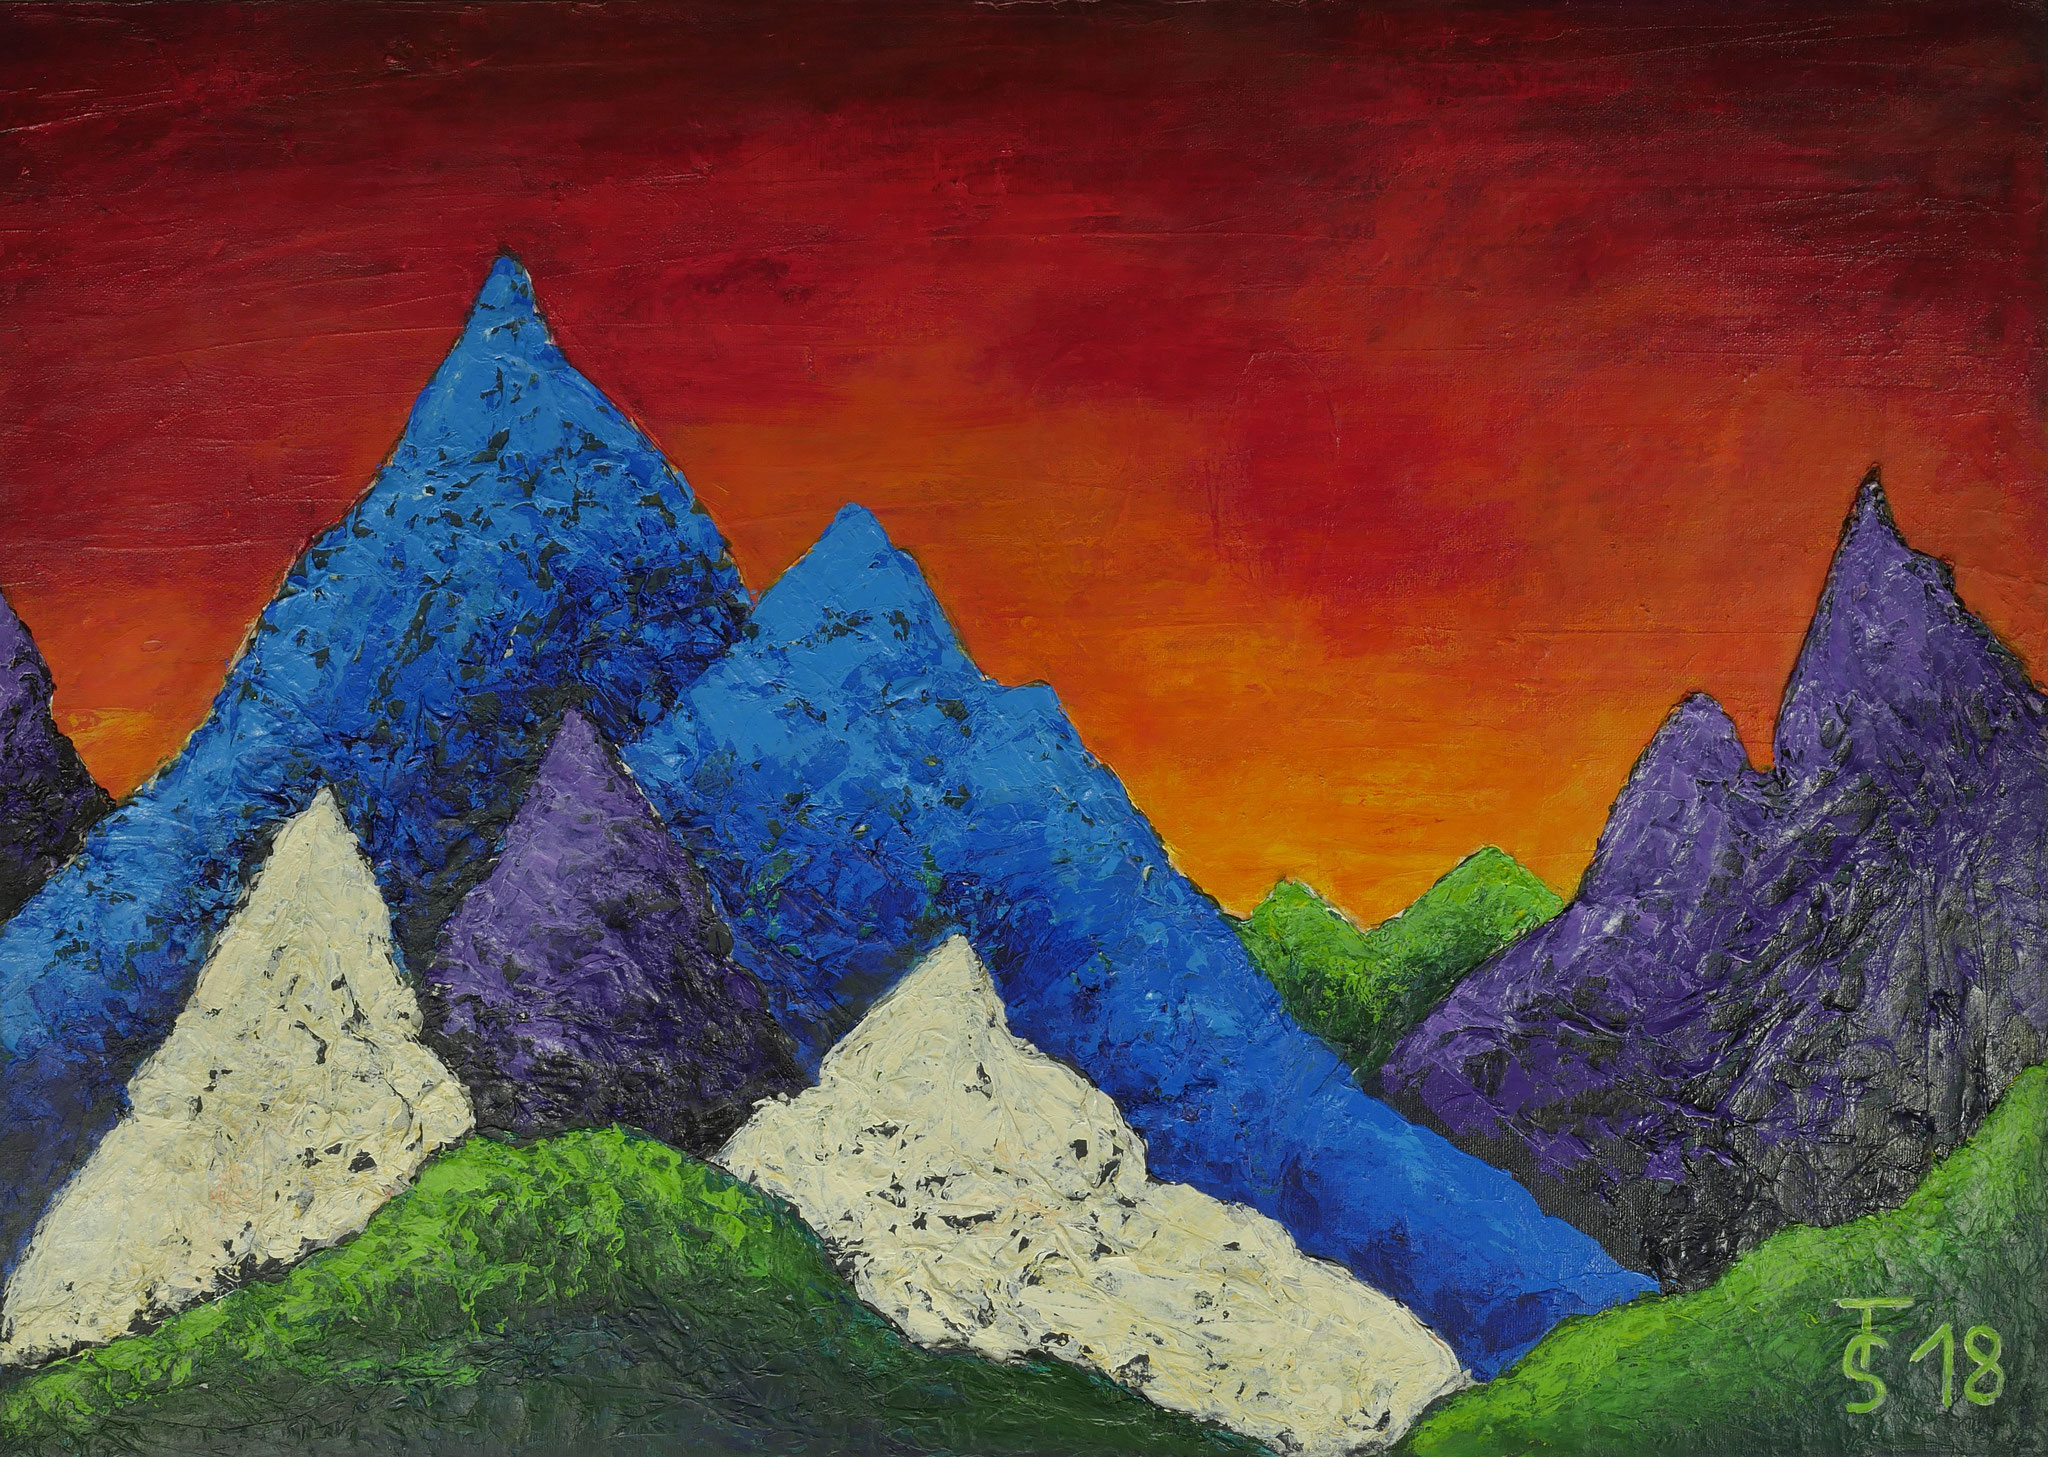 Berg-Magie_ (Acryl auf Leinwand, 70 x 50 cm)